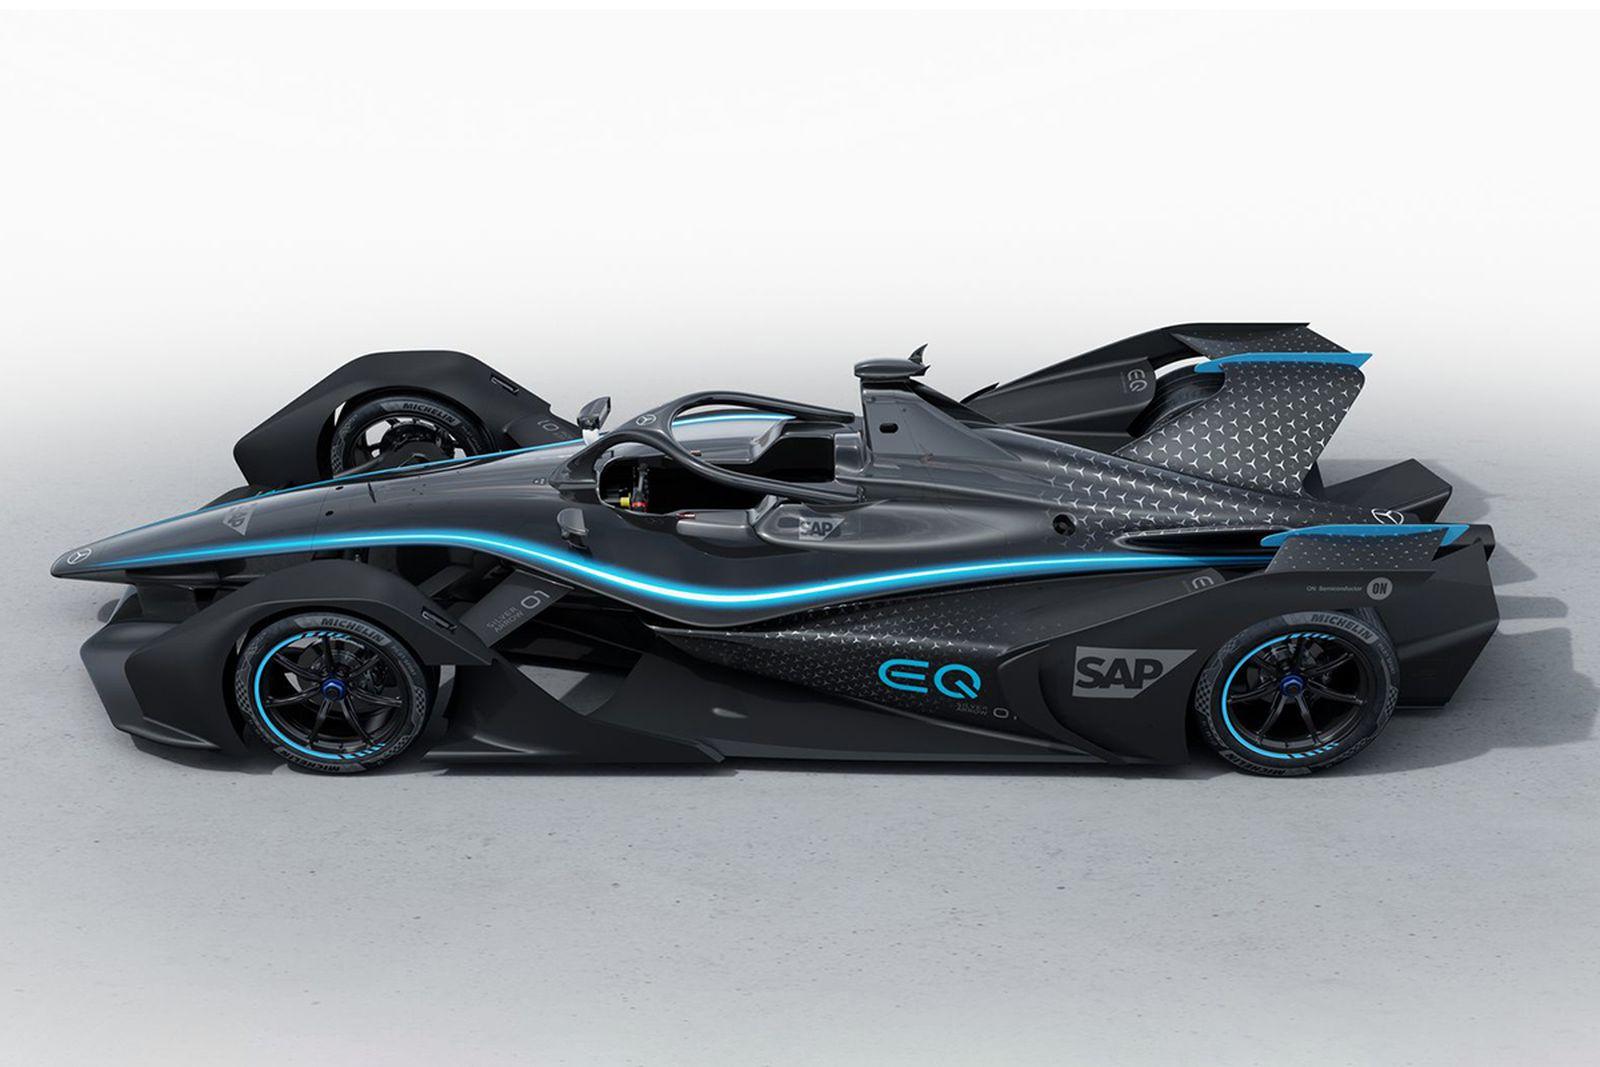 mercedes benz electric race car 2019 Geneva Motor Show mercedes-benz